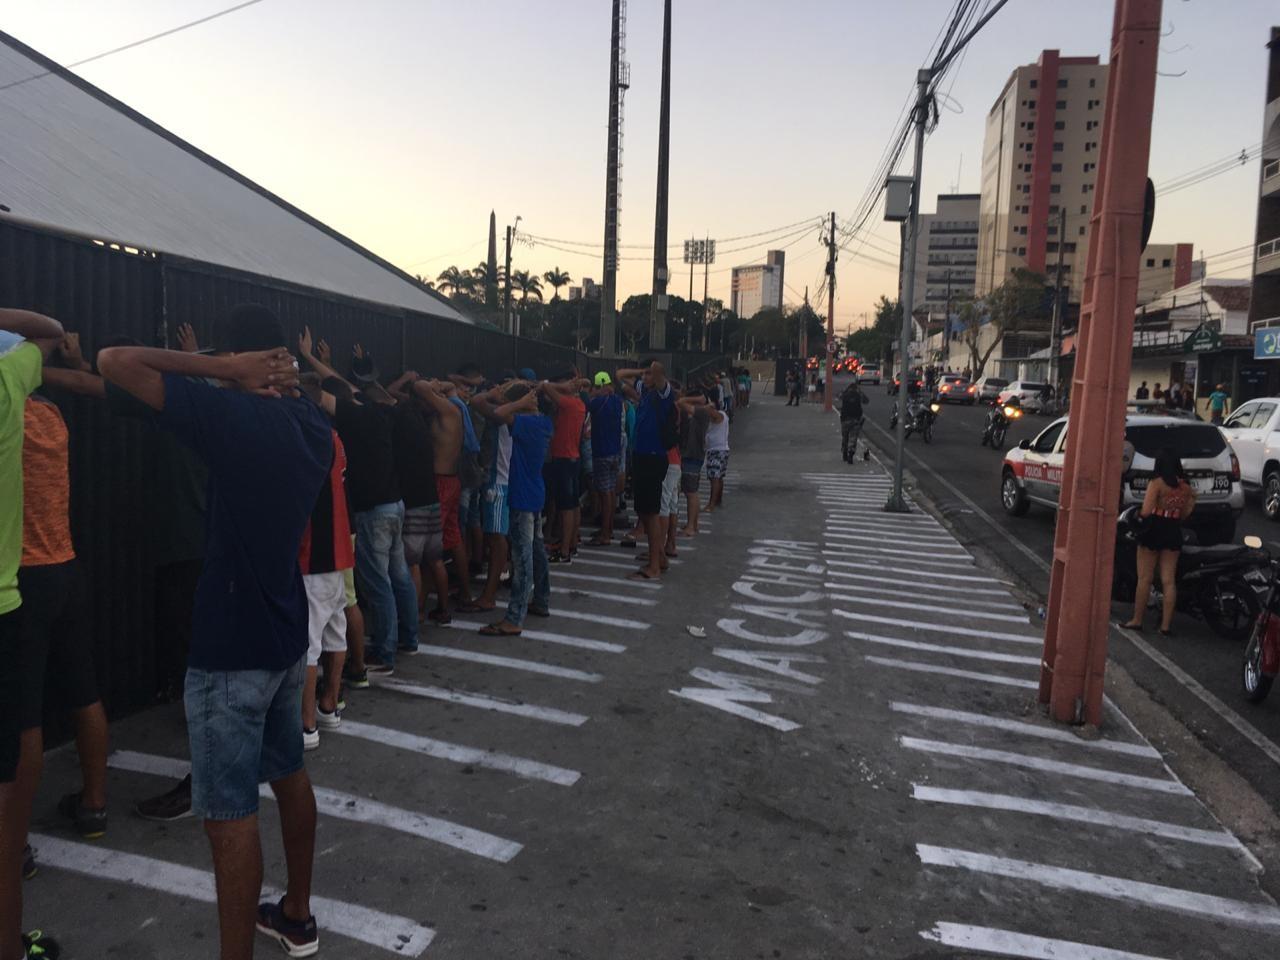 Polícia aborda 300 pessoas e apreende drogas, armas brancas e veículos, na Paraíba